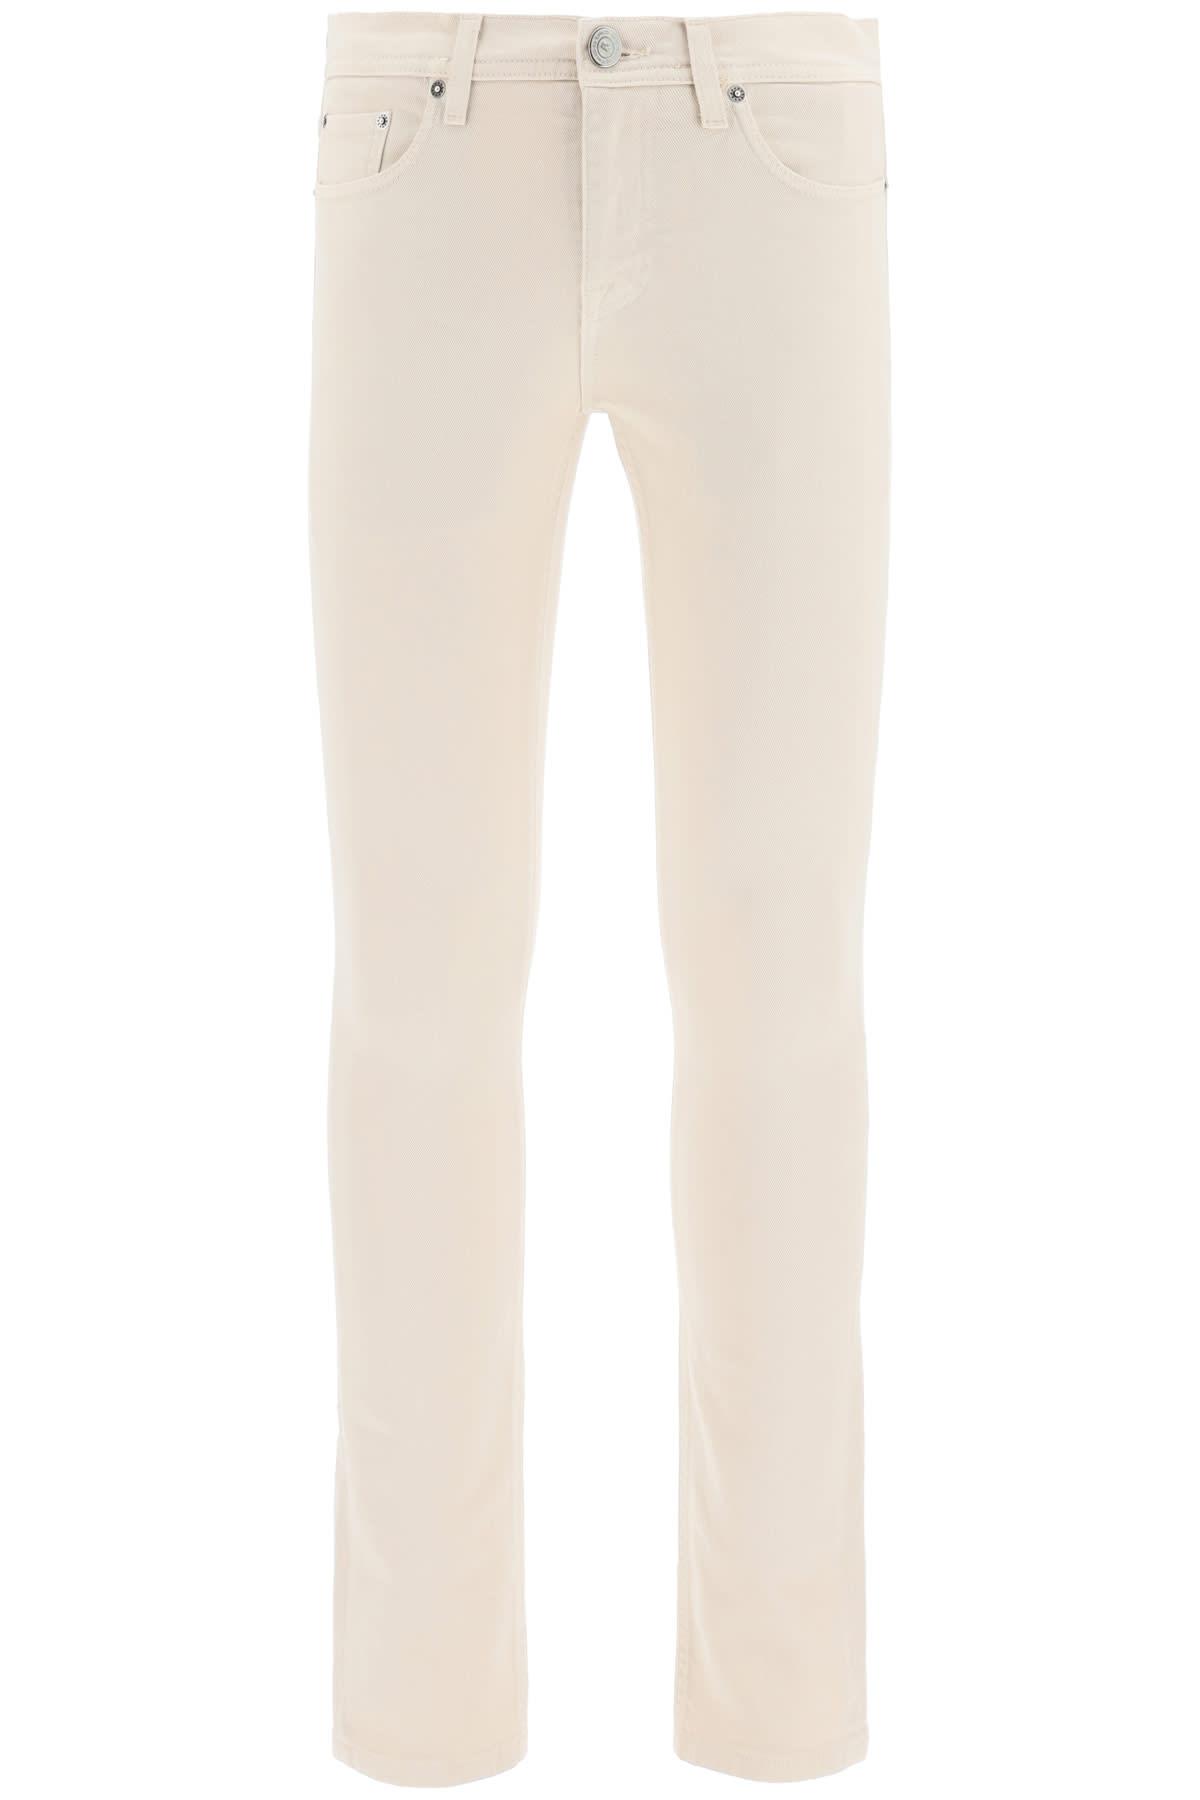 Etro Slim Fit Basic Jeans